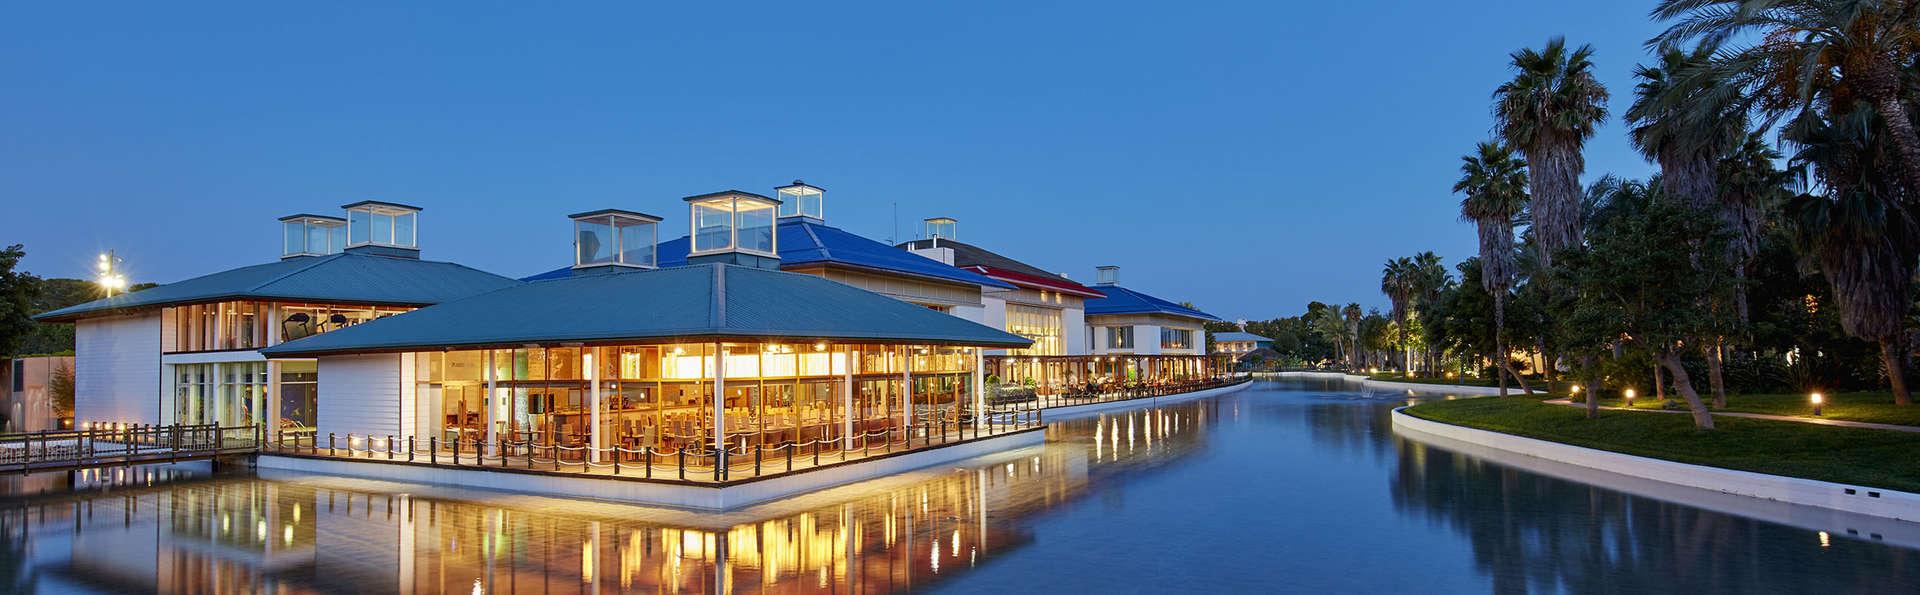 PortAventura Hotel Caribe Salou Espagne - Hotel caraibes port aventura